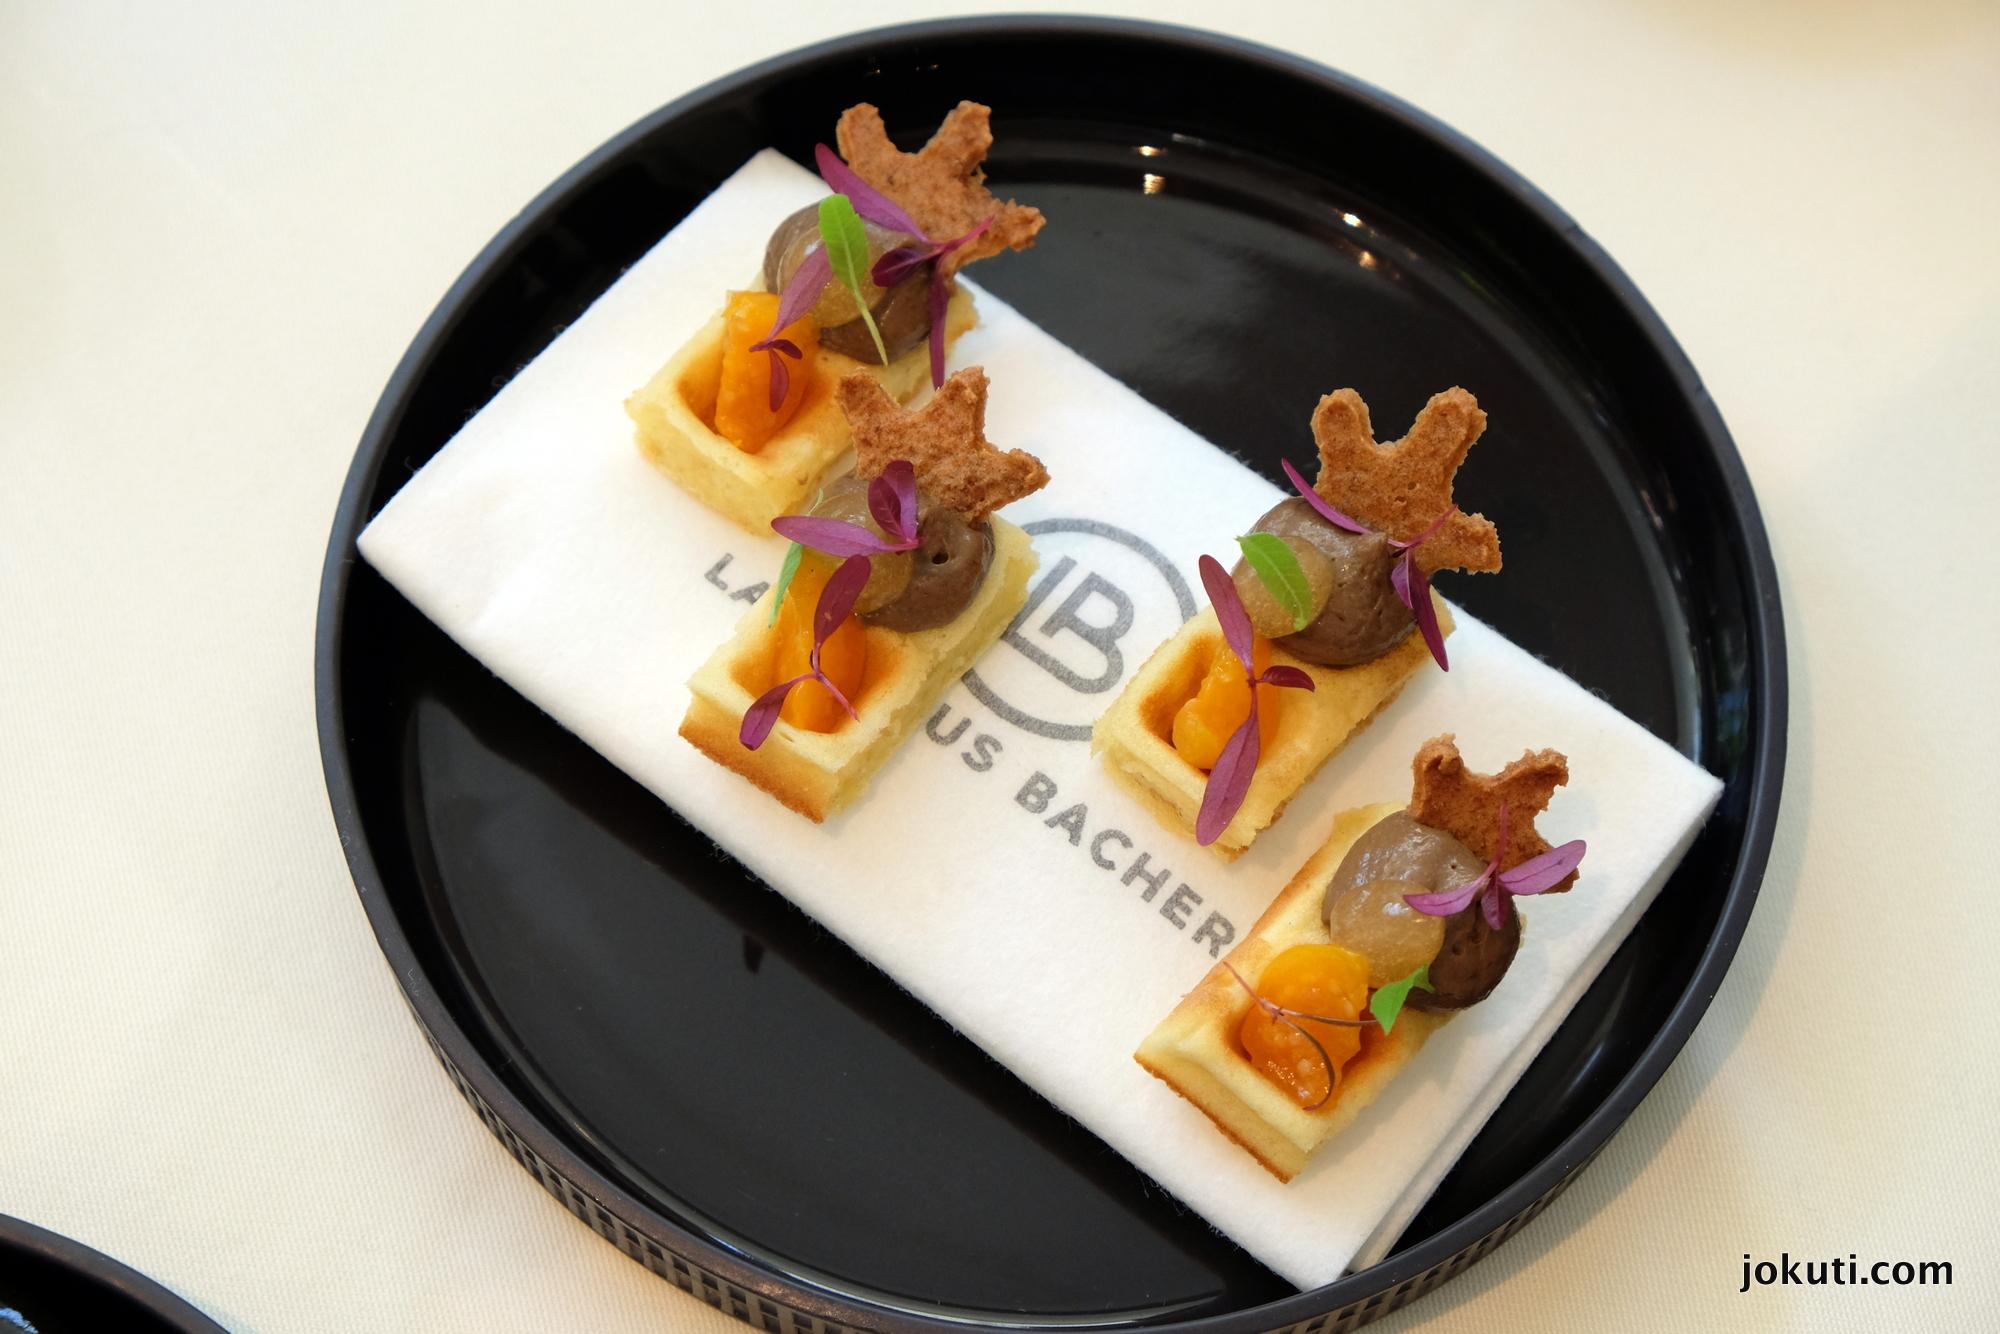 dscf7655_ausztria_austria_vilagevo_jokuti_landhaus_bacher_dorfer_mautern_wachau_reitbauer_restaurant.jpg